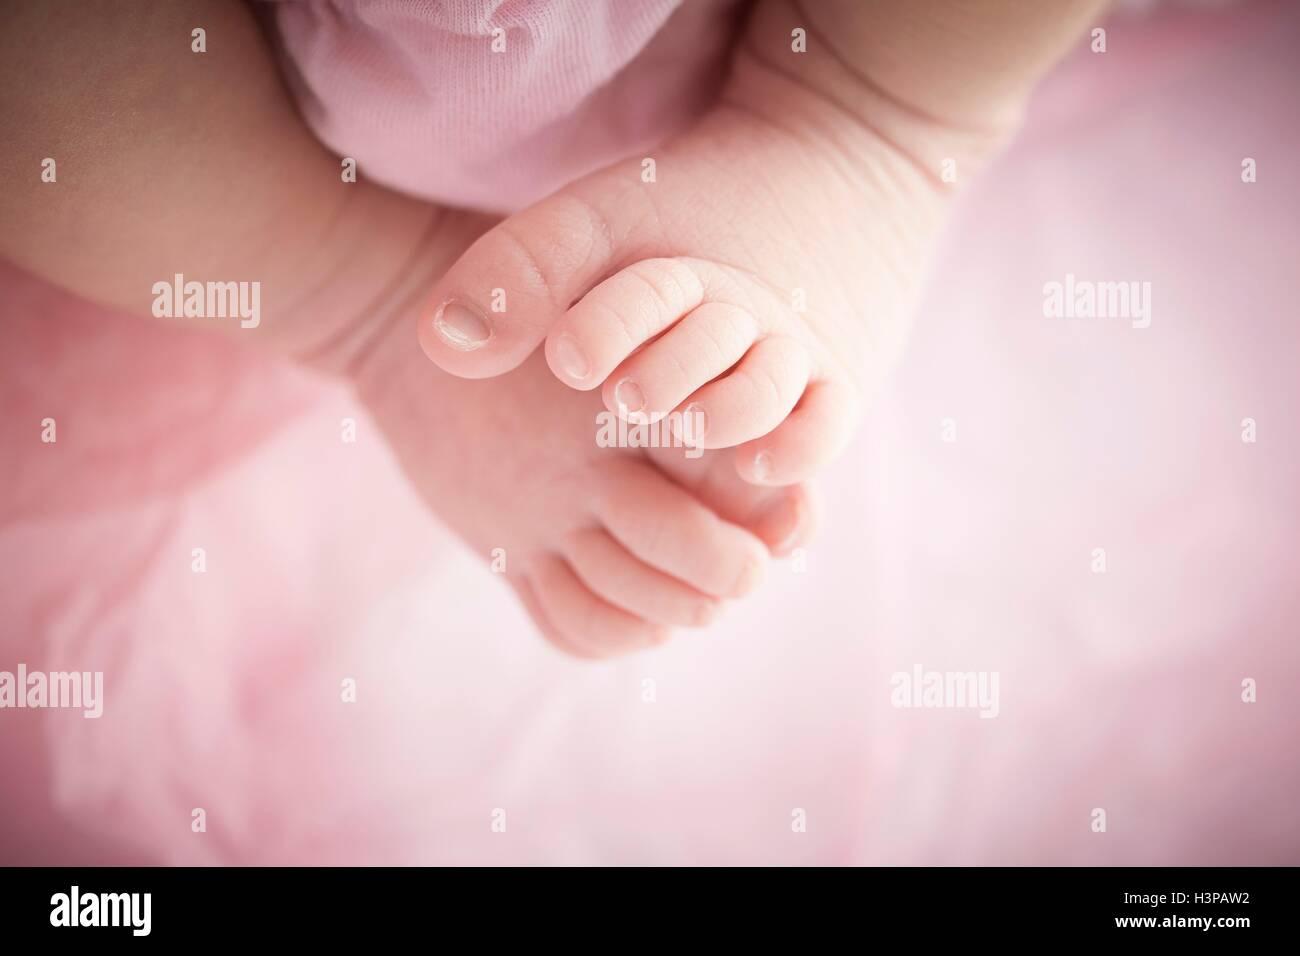 MODEL RELEASED. Newborn baby girl's bare feet, close up. - Stock Image